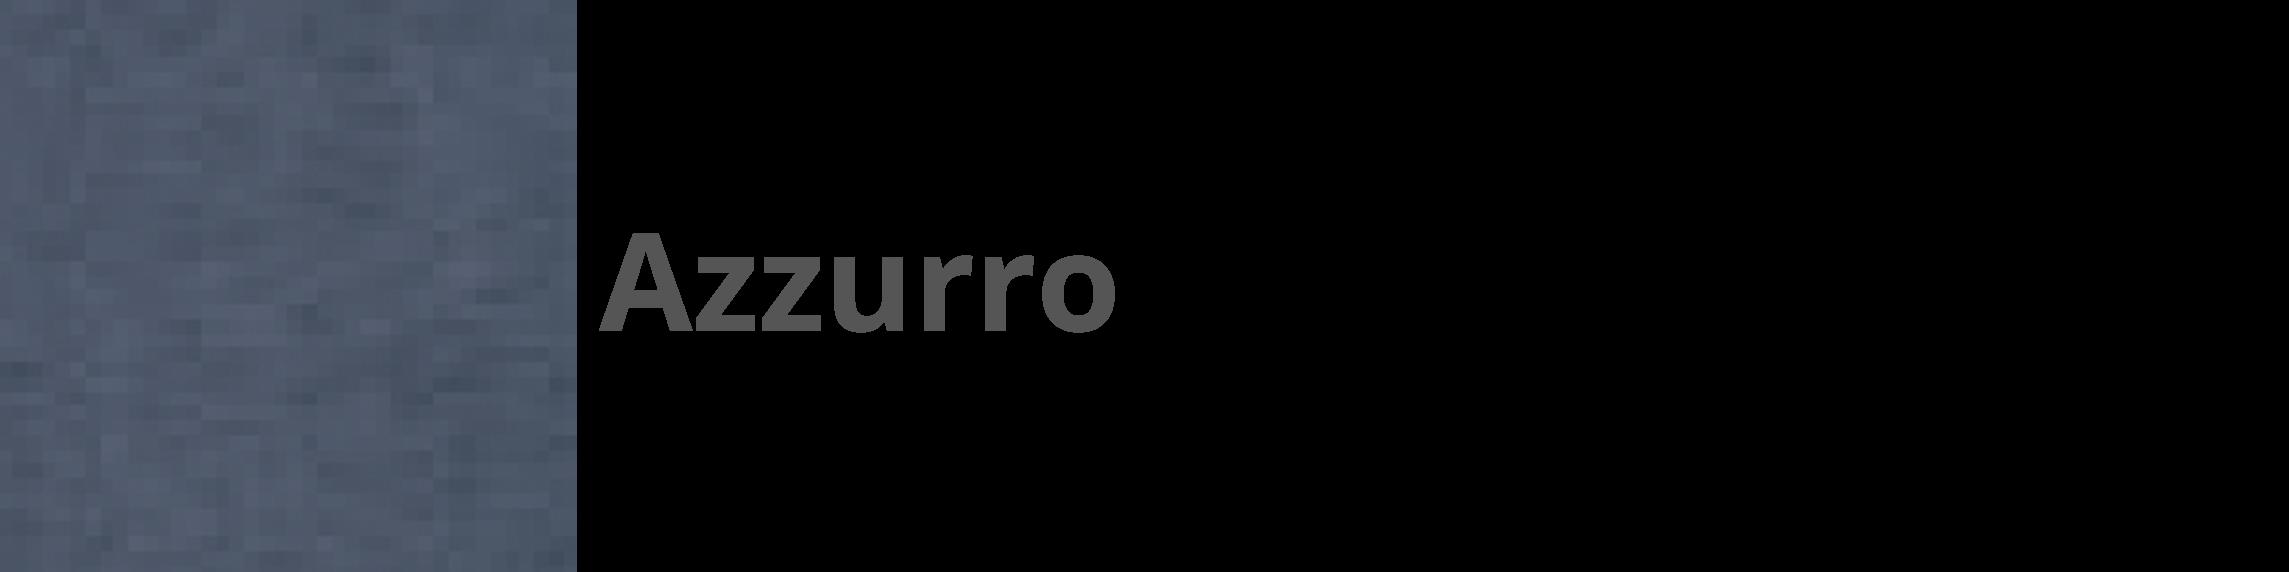 8034-Azzuro